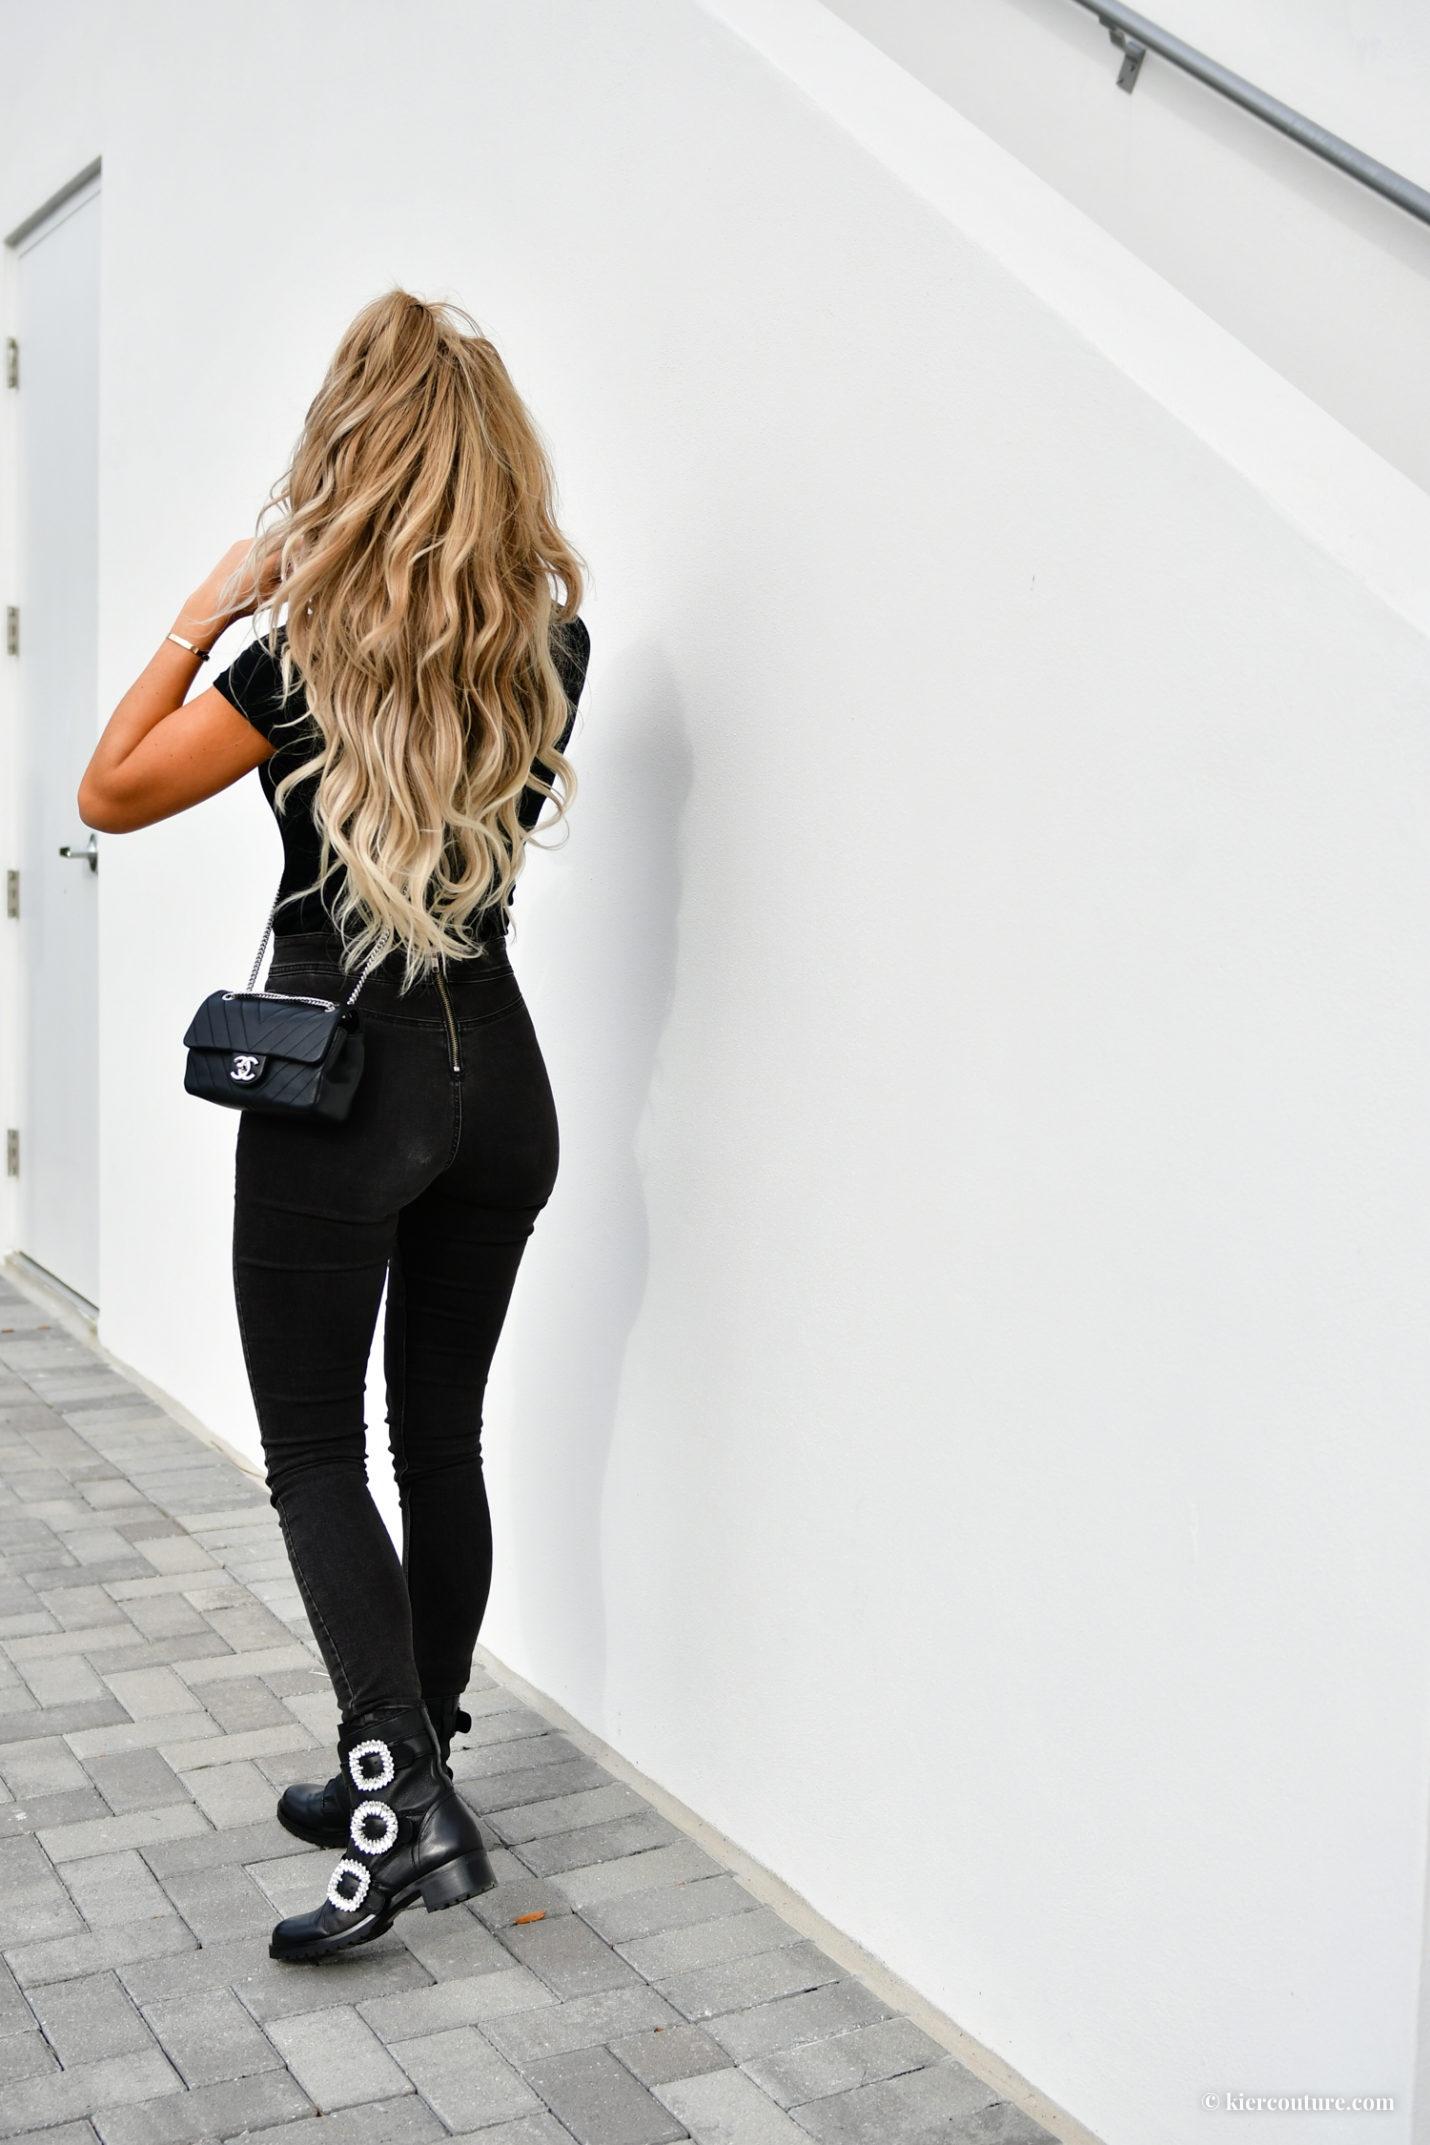 Bellami hair